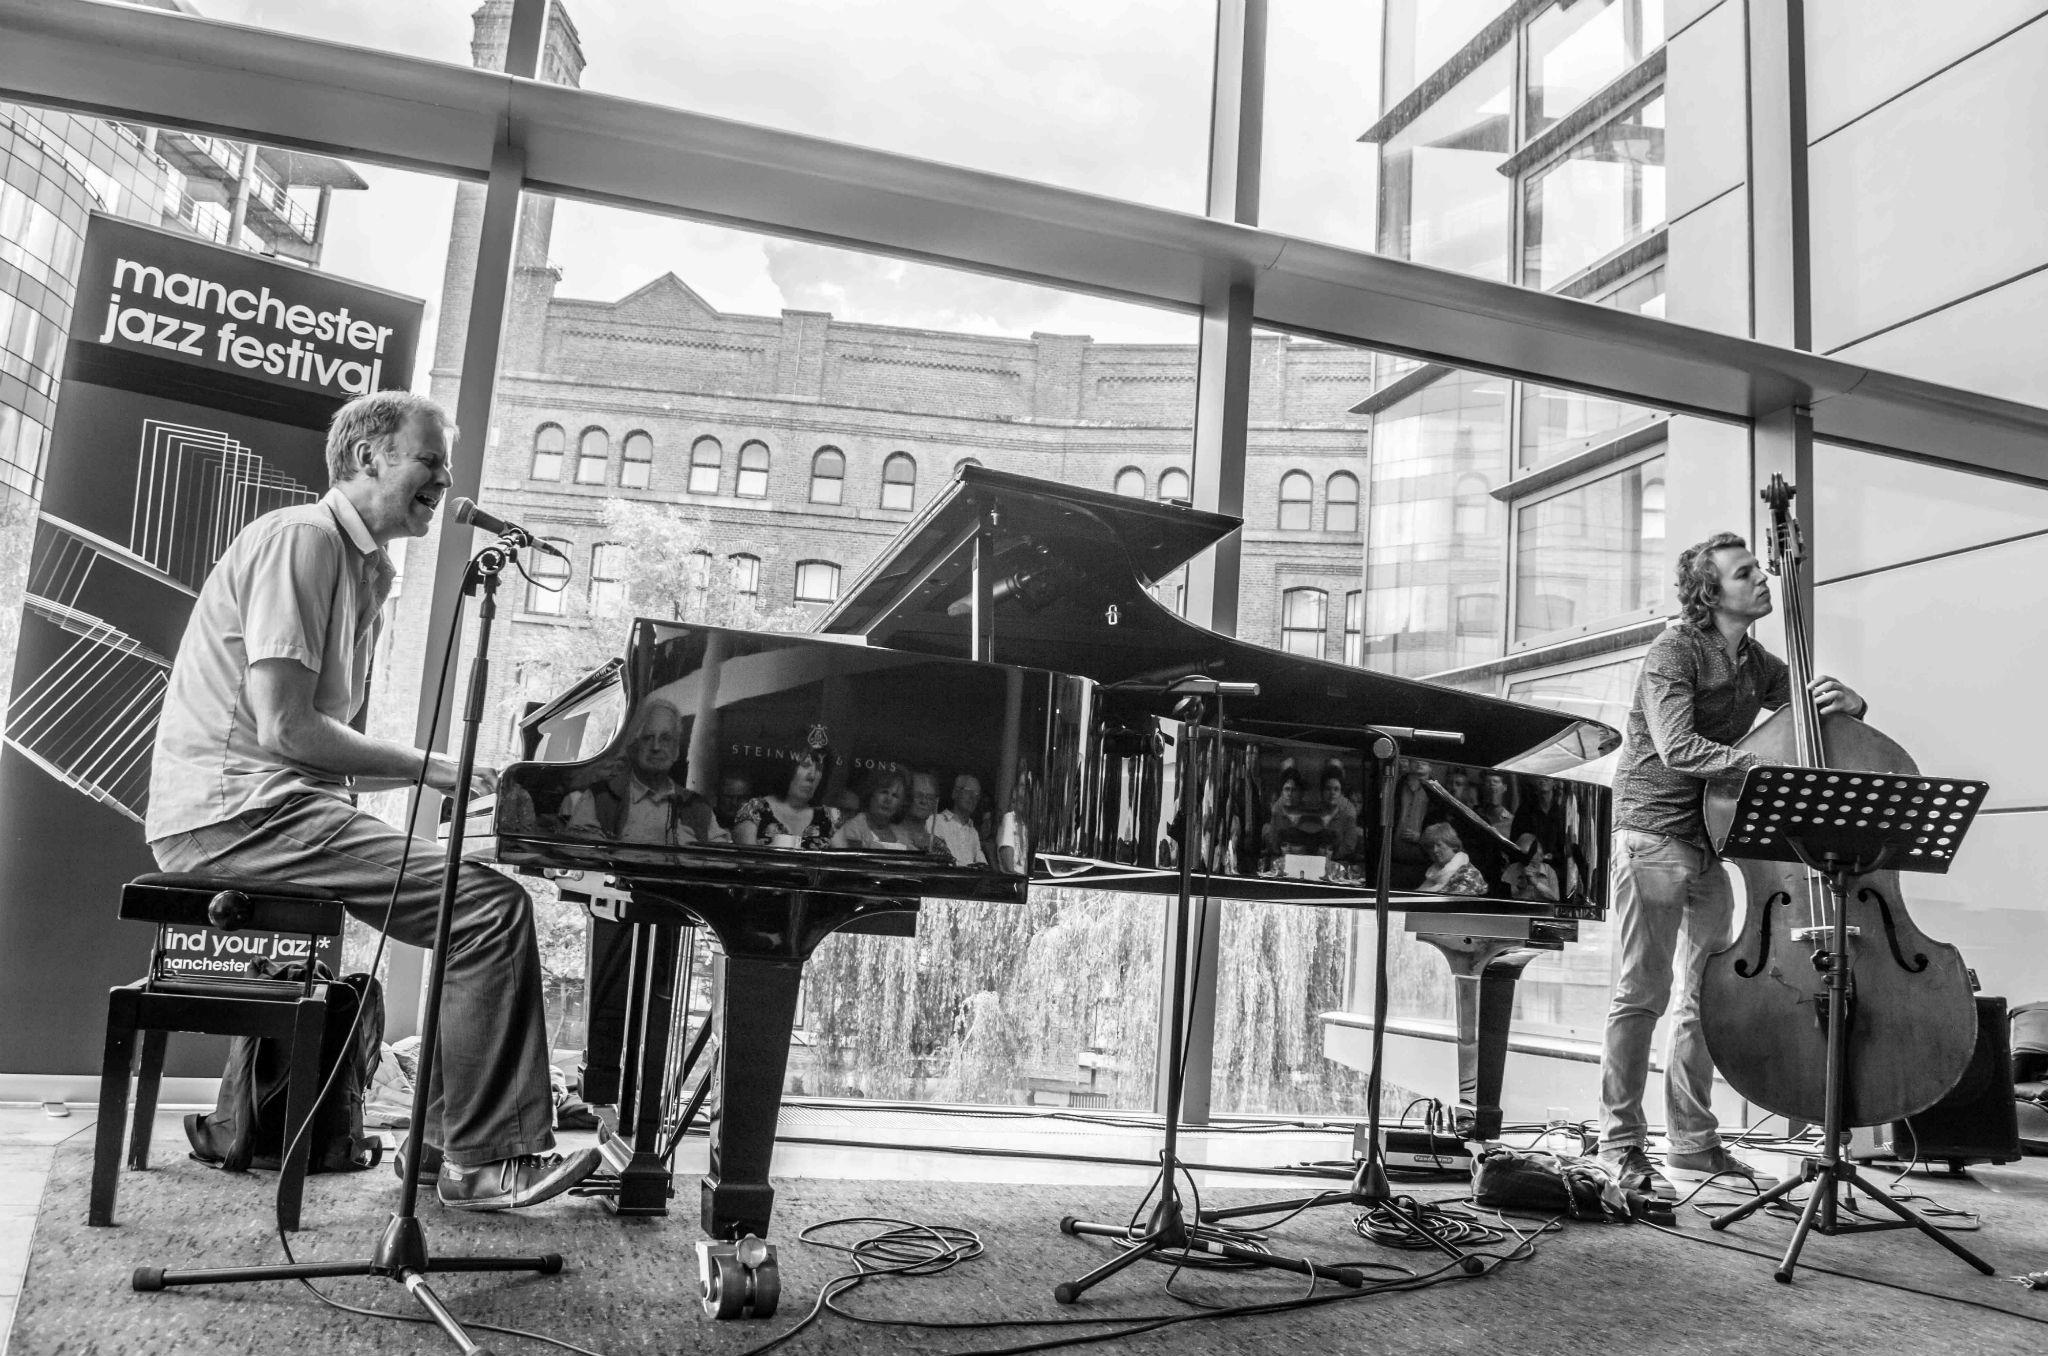 John Ellis at Manchester Jazz Festival